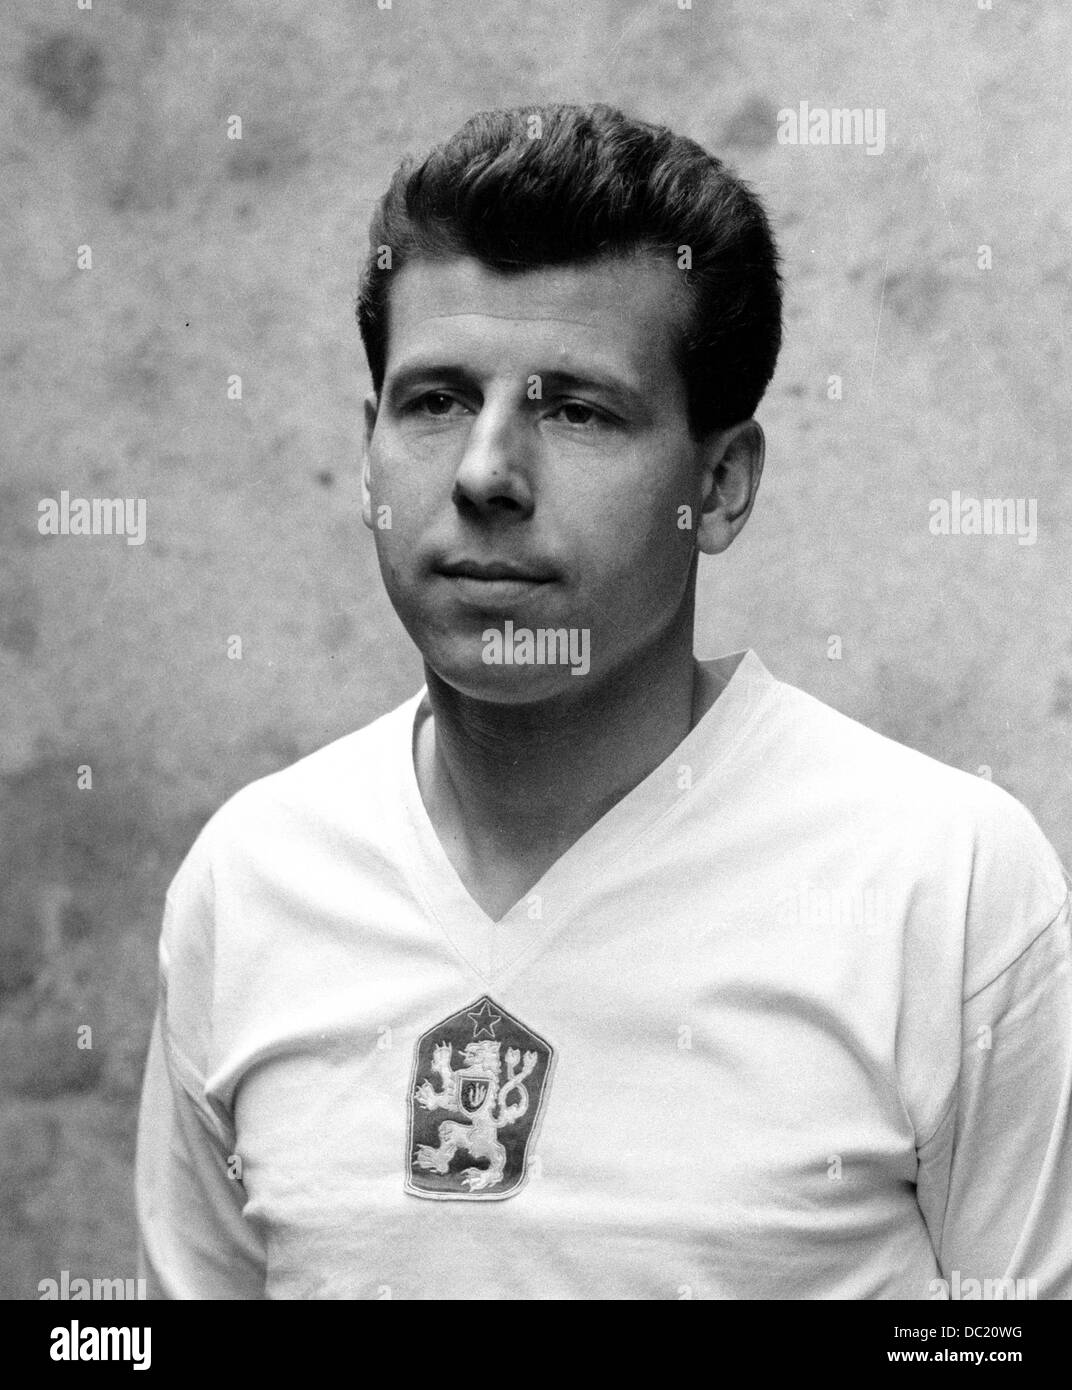 Soccer player Josef Masopust member of the silver medal winning